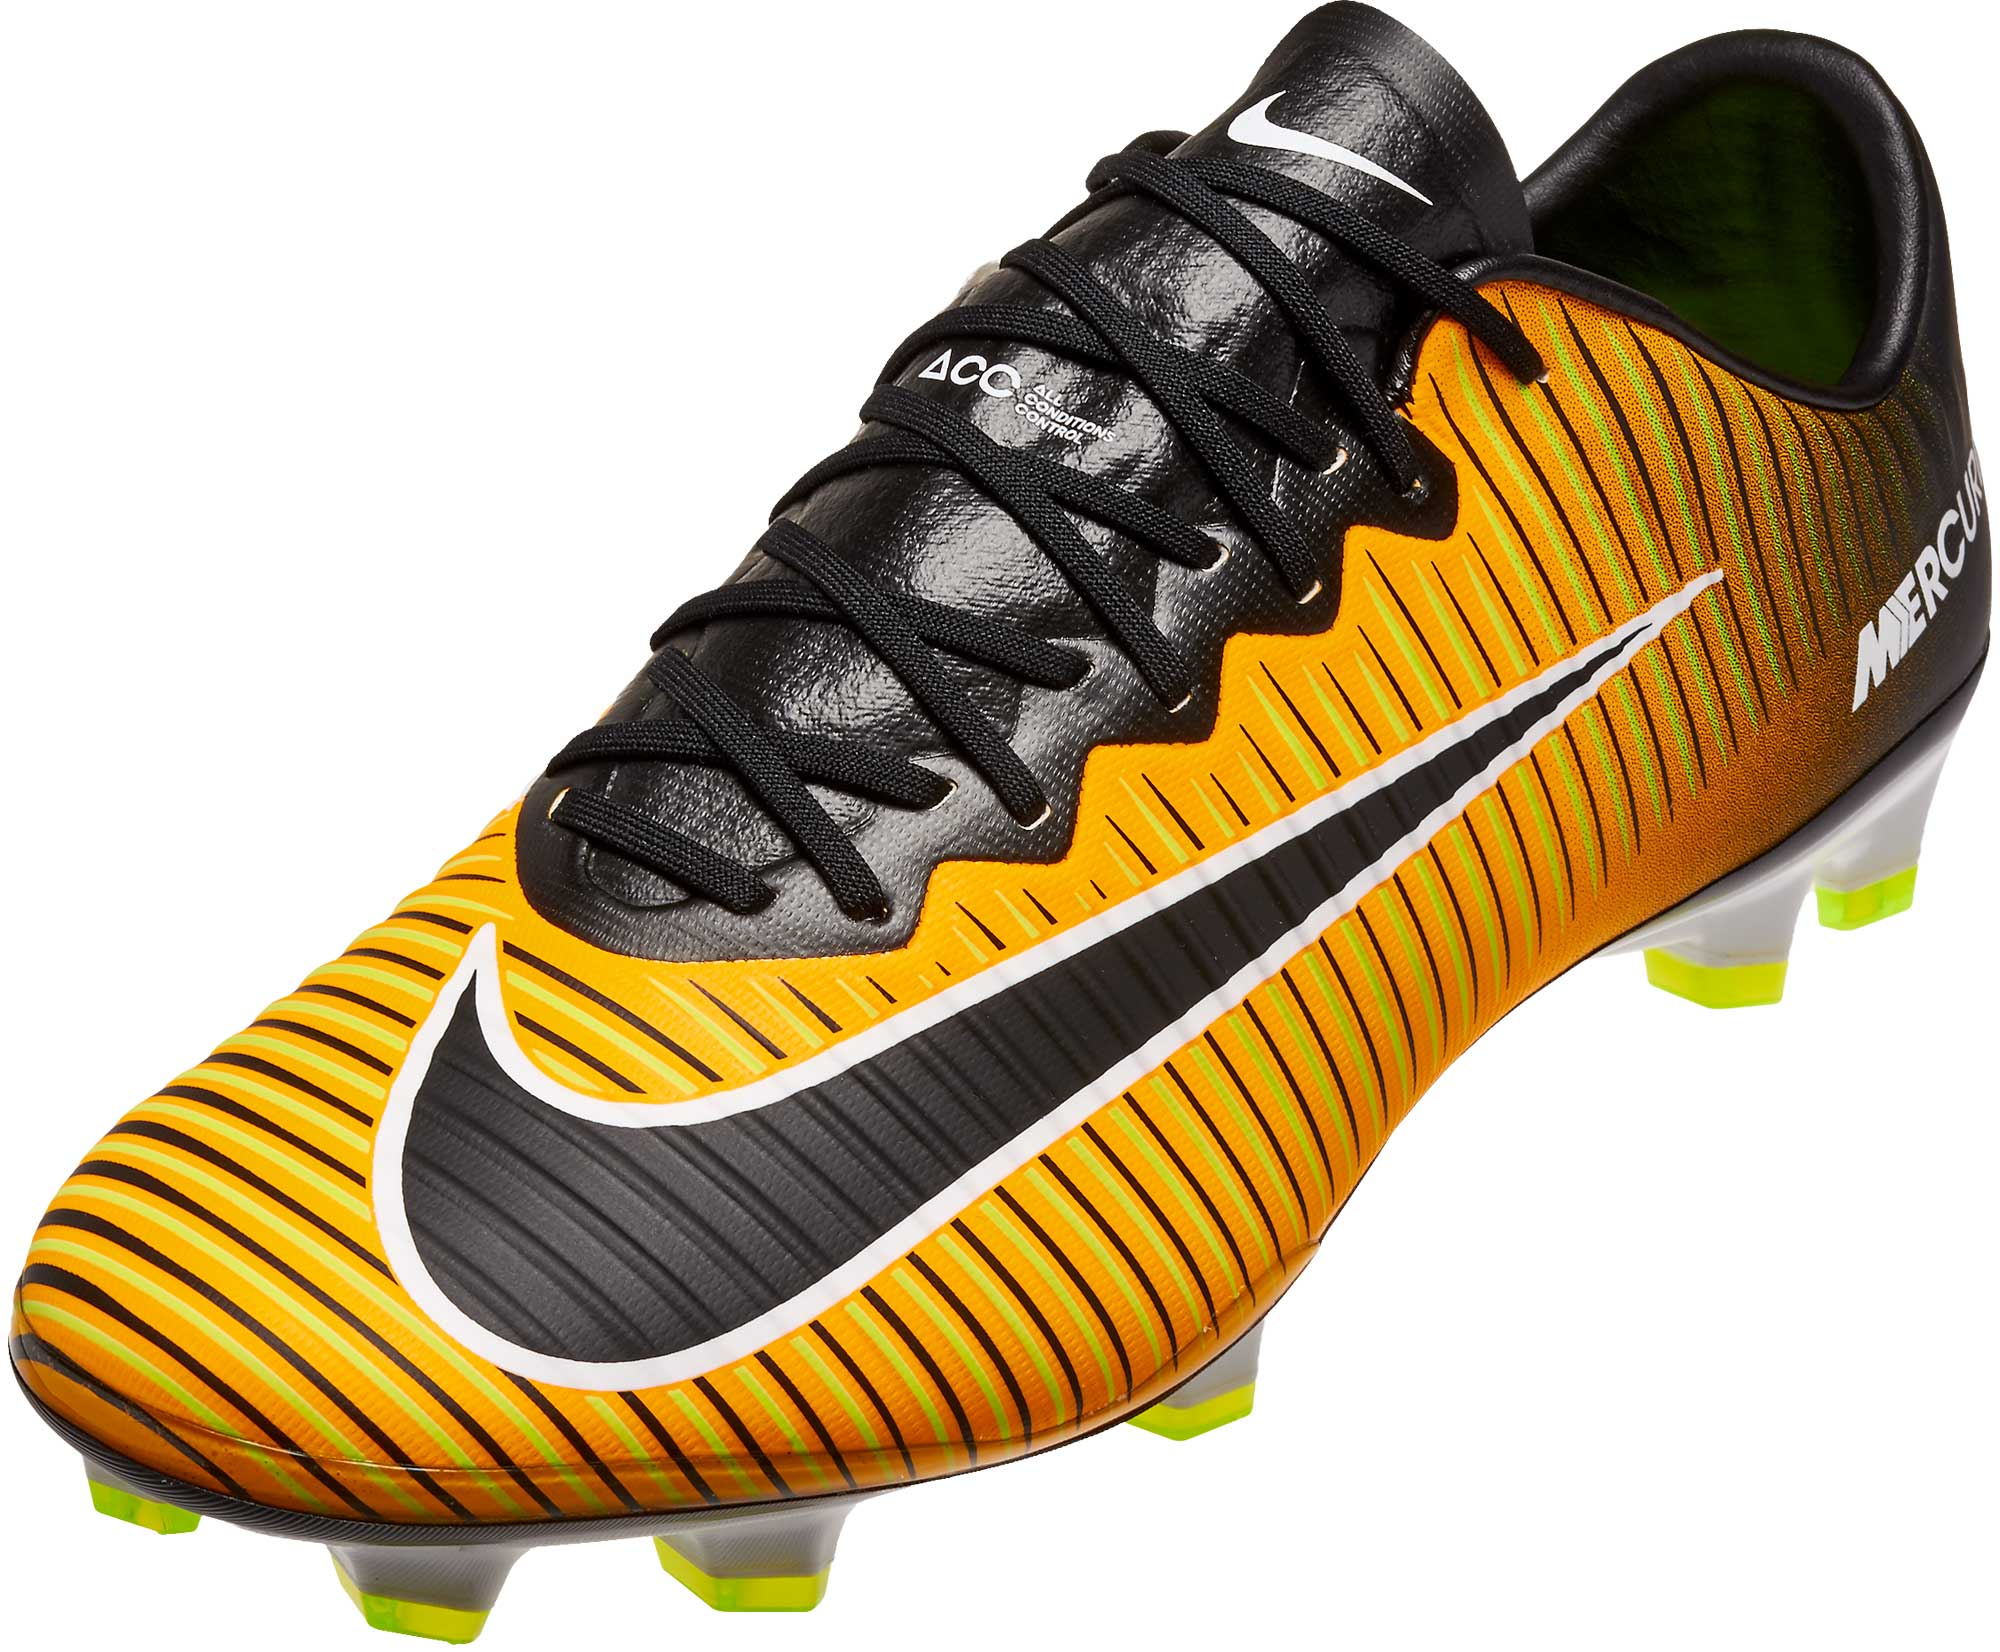 b9eb118fb Nike Mercurial Vapor XI FG Soccer Cleats - Laser Orange   Black ...